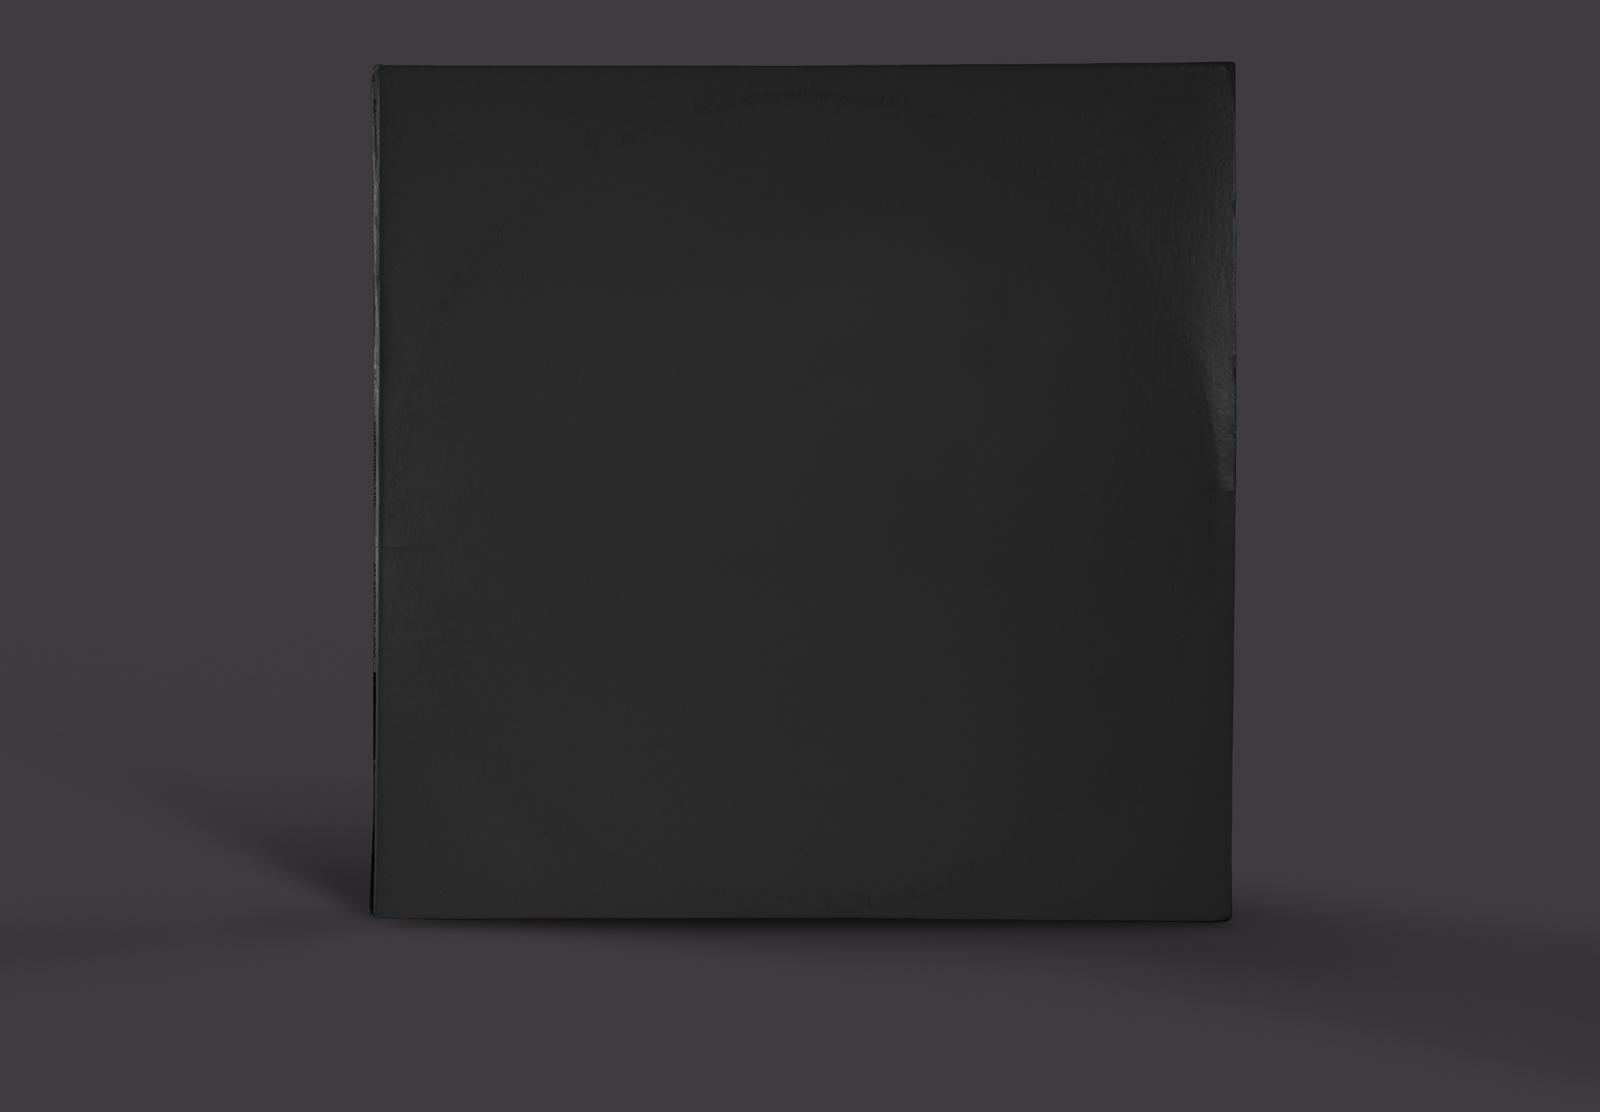 The Vinyl Record Mockup Templates Get An Upgrade Go Media